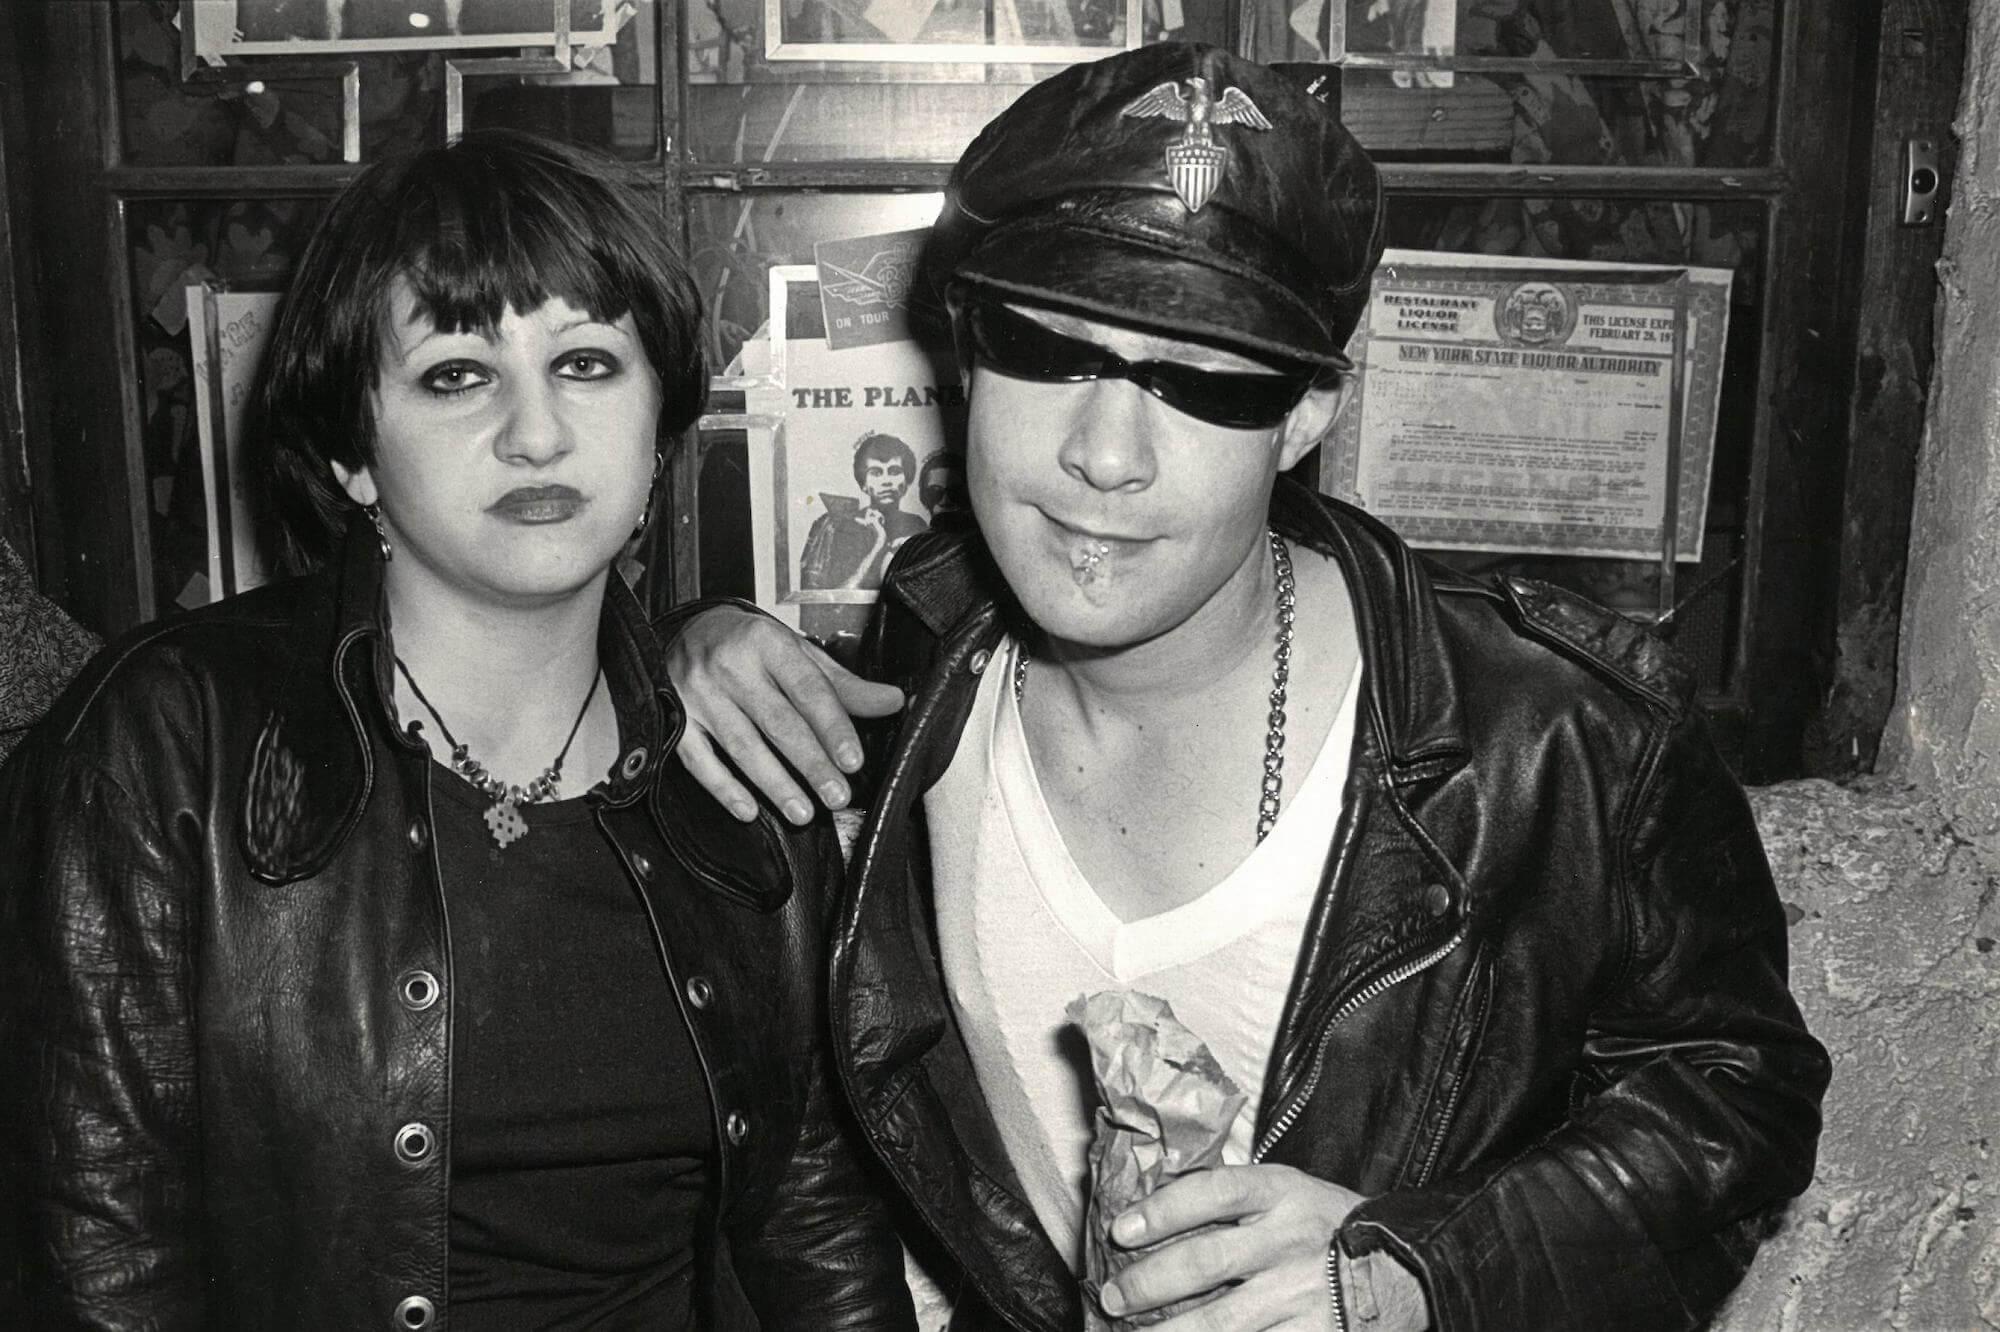 Punks Outside CBGB, 1977